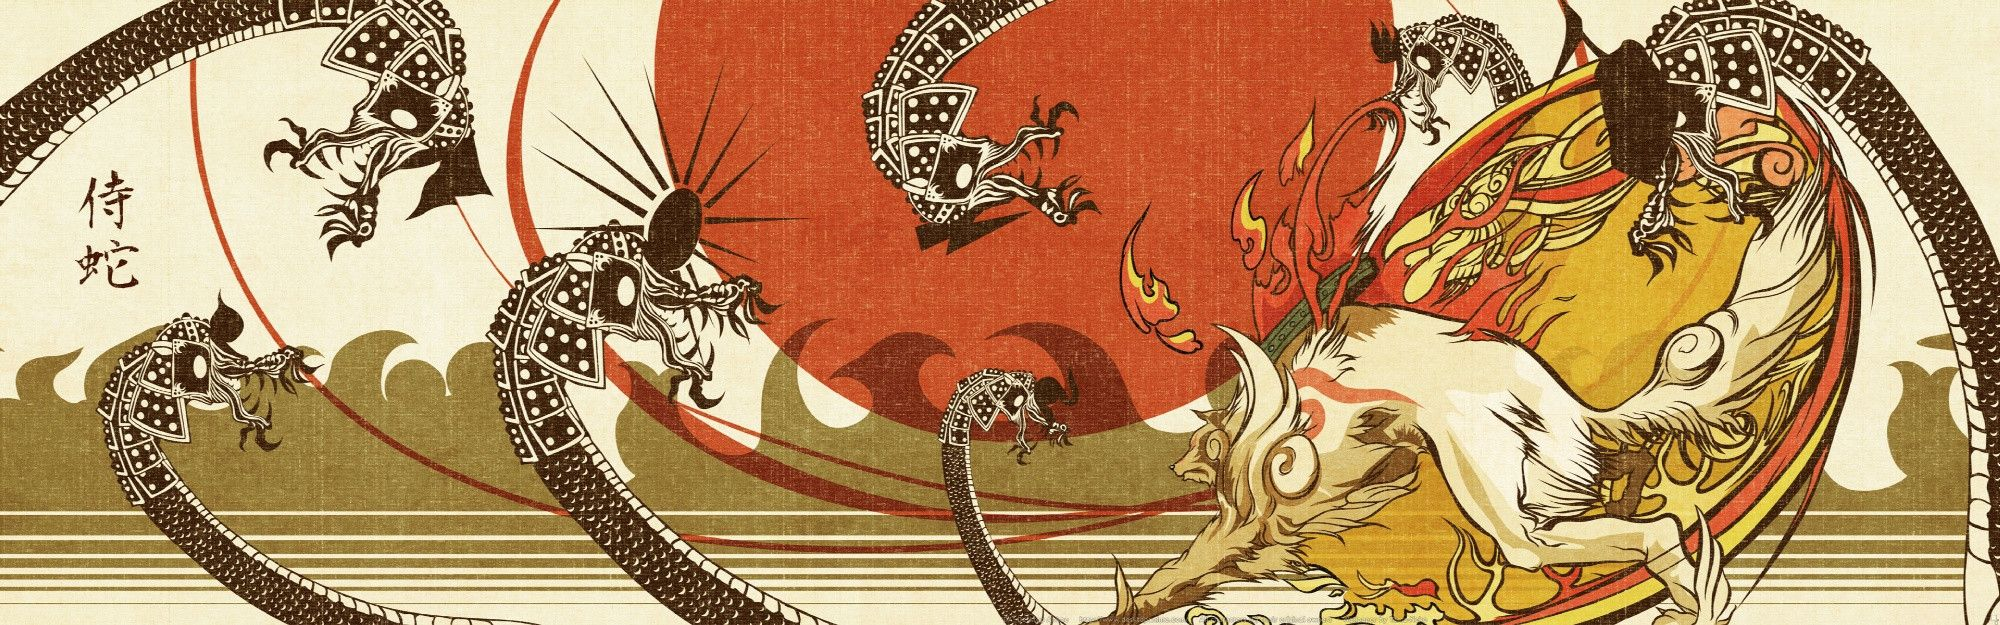 Gaming Wall Paper Dump Album On Imgur Dual Monitor Wallpaper Okami Amaterasu